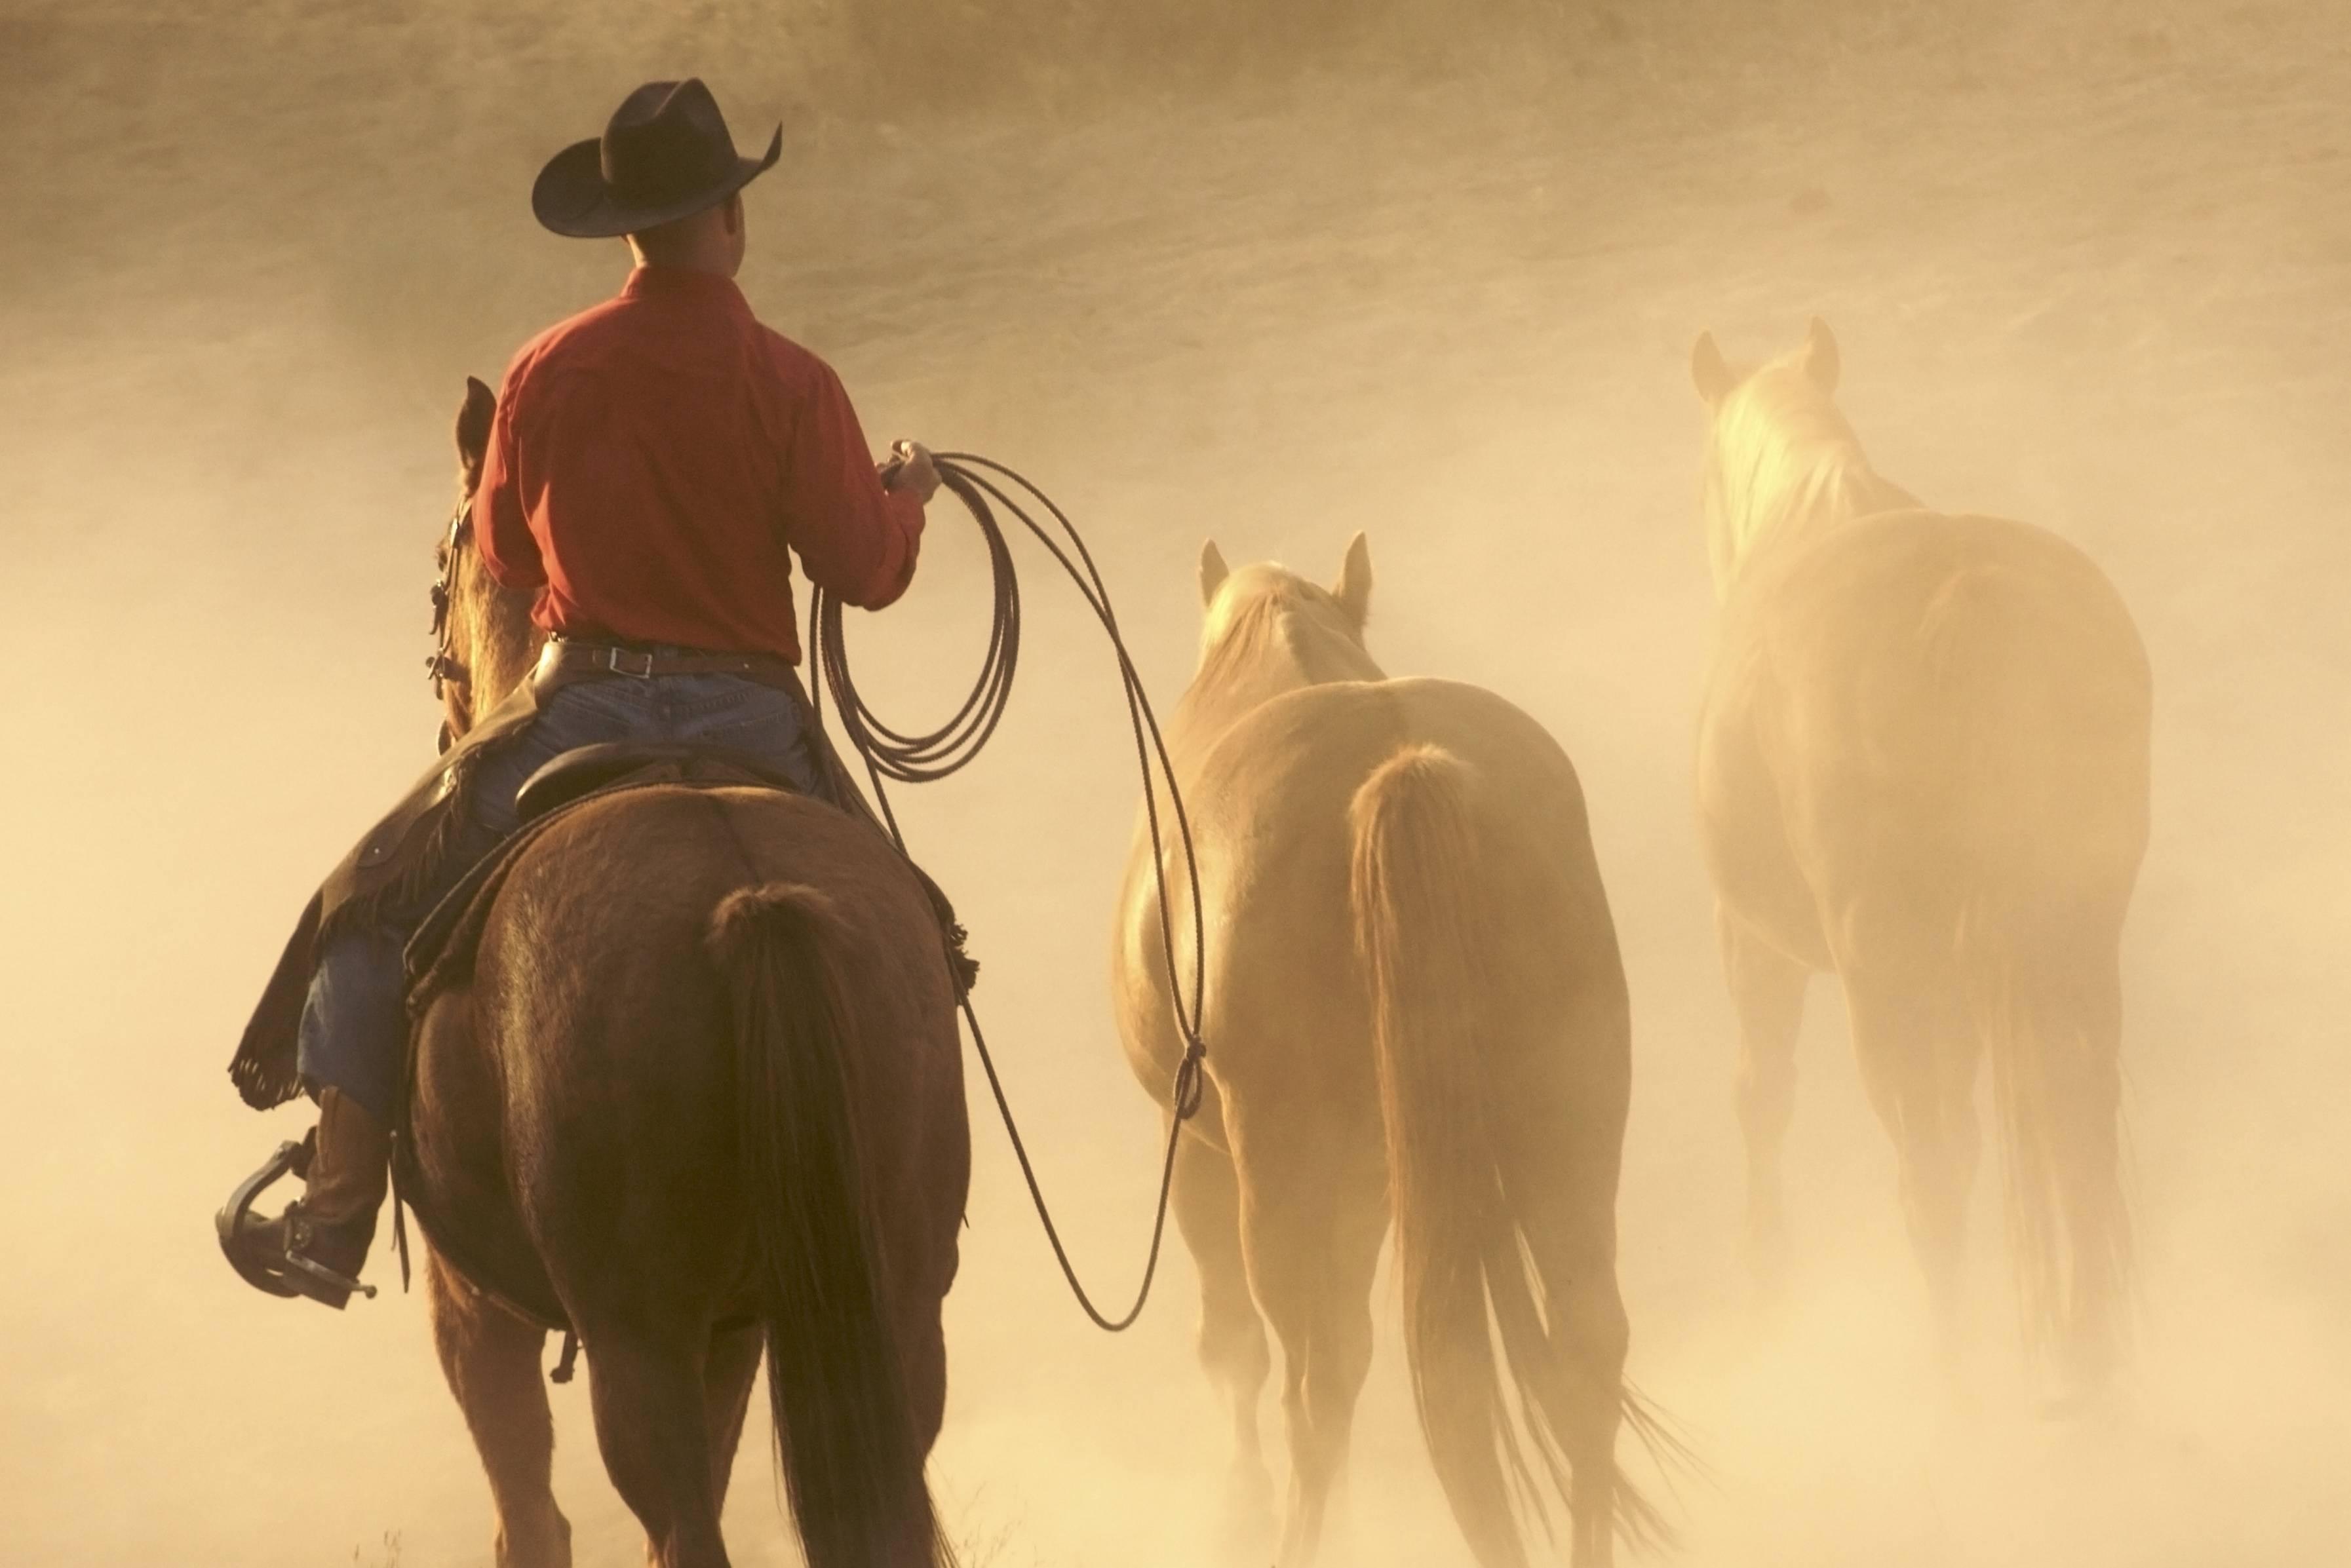 Amerikaanse cowboy dating site conflict in adolescent dating relaties inventaris (Chantal Wolfe et al. 2001)